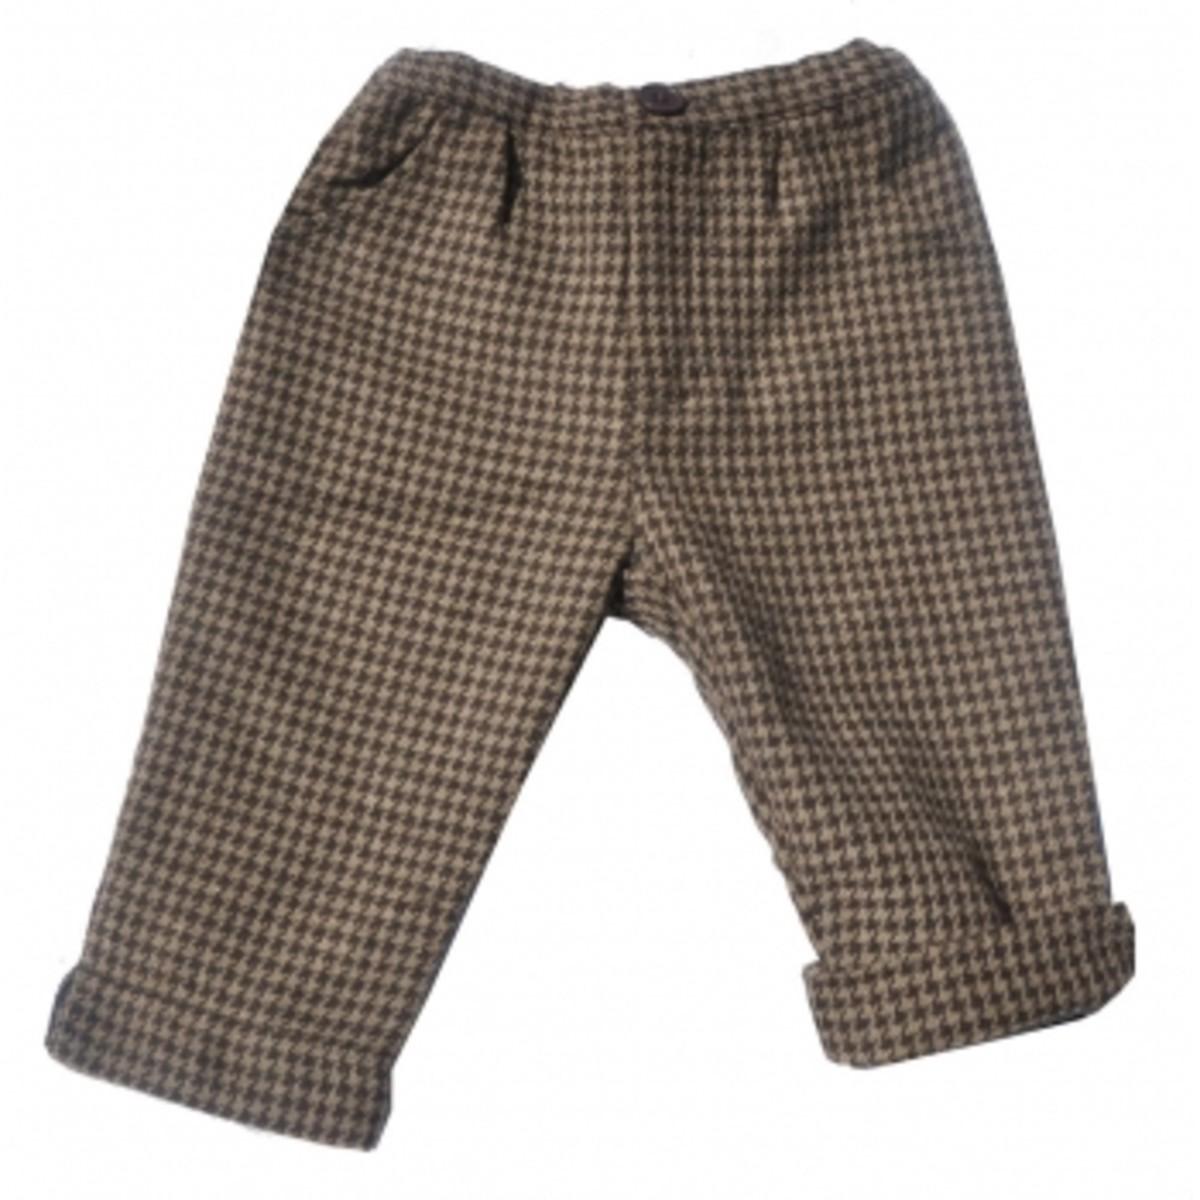 pantalon_tweed_marron-350x350